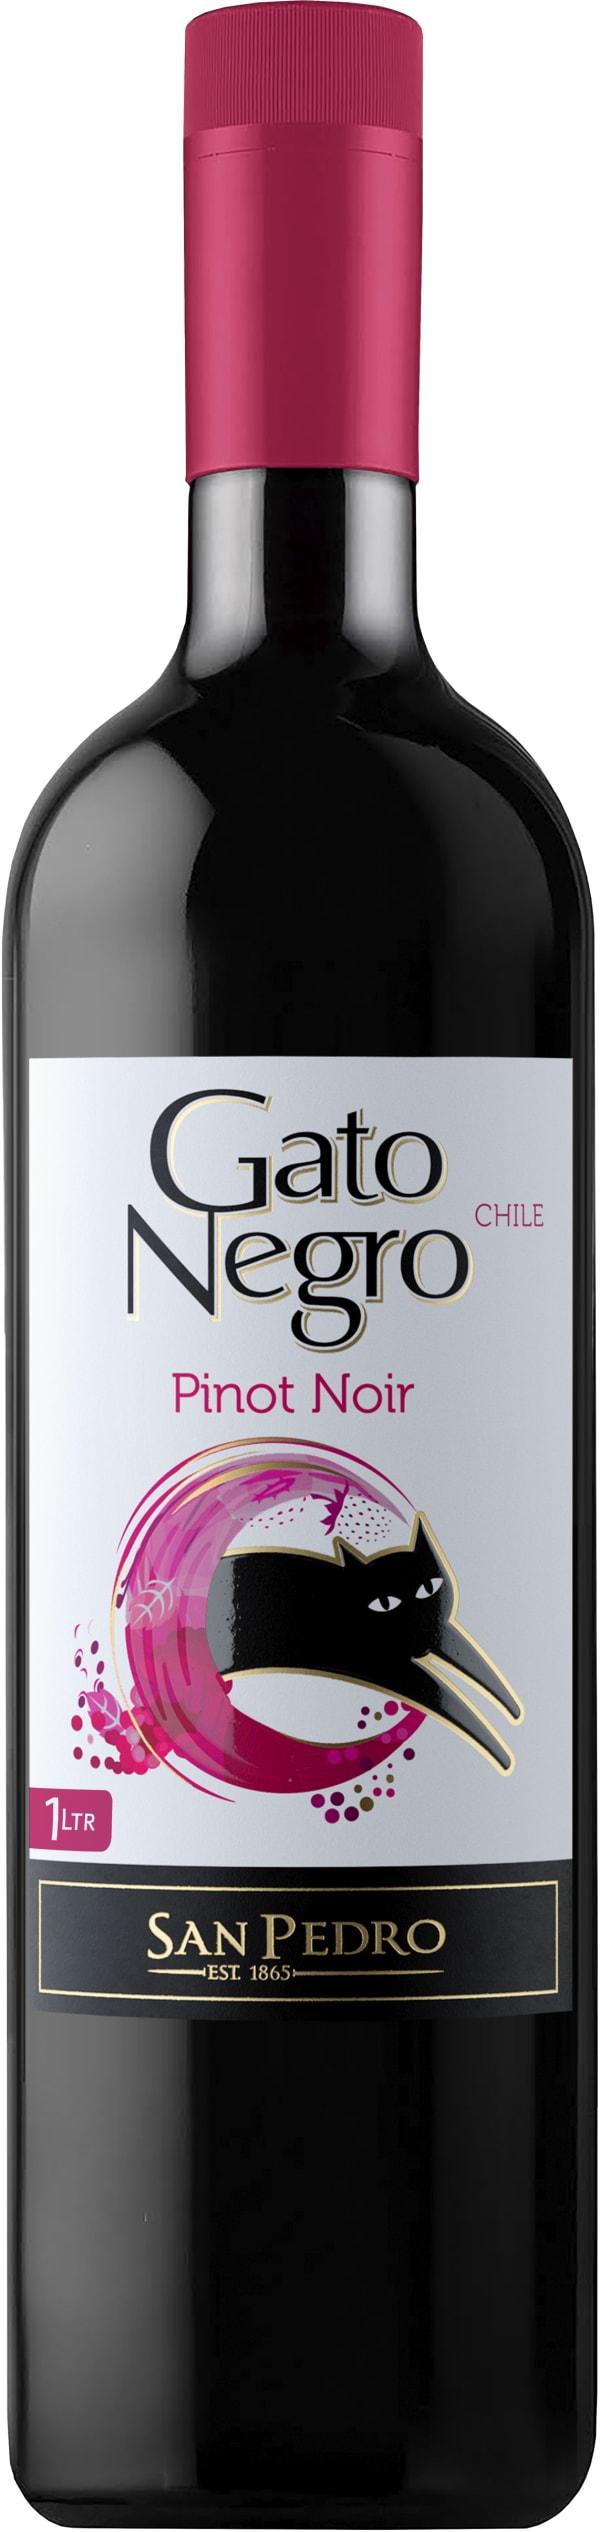 Gato Negro Pinot Noir 2018 muovipullo